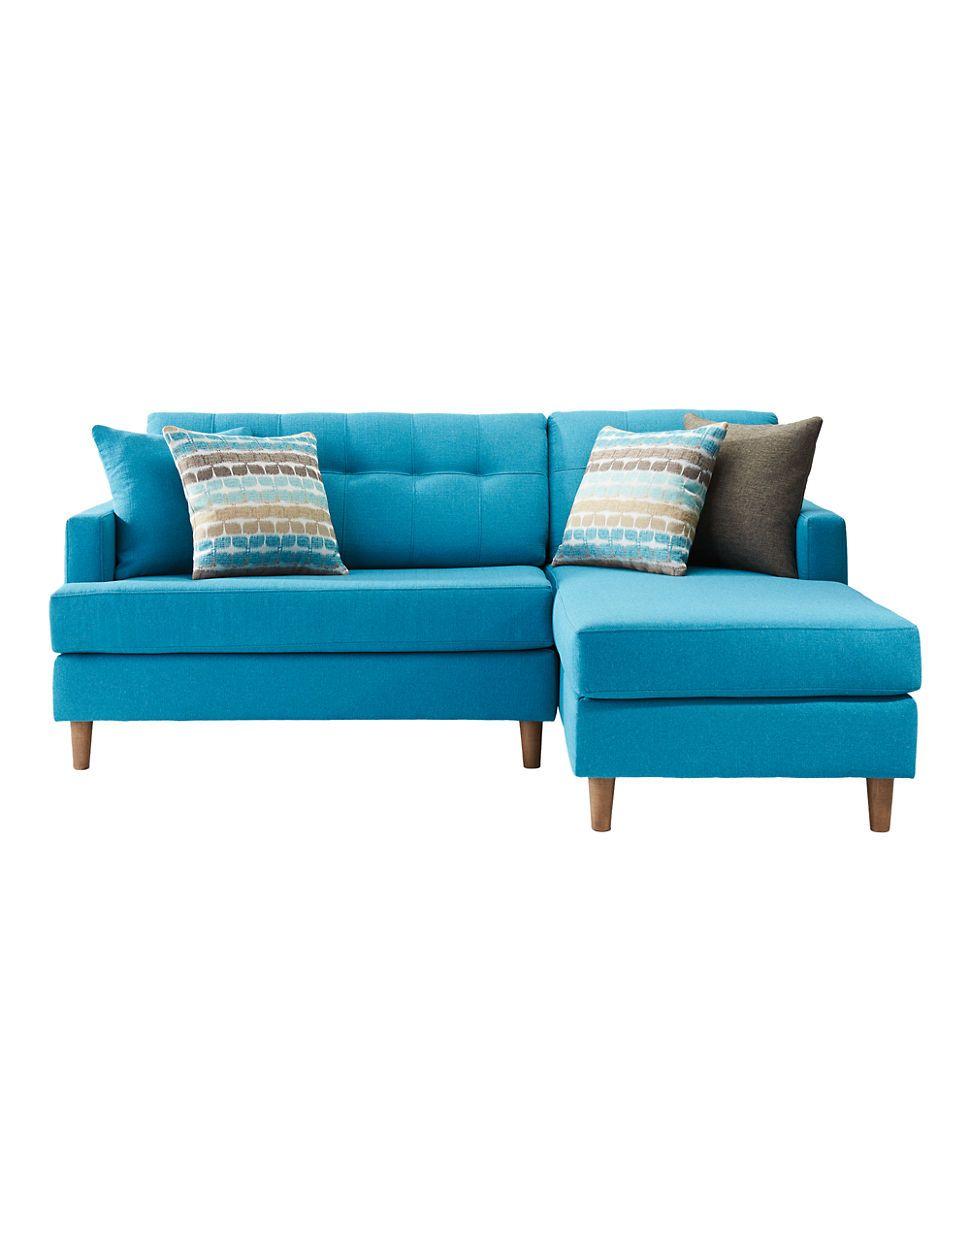 home living amber 79in sectional sofa hudson 39 s bay. Black Bedroom Furniture Sets. Home Design Ideas